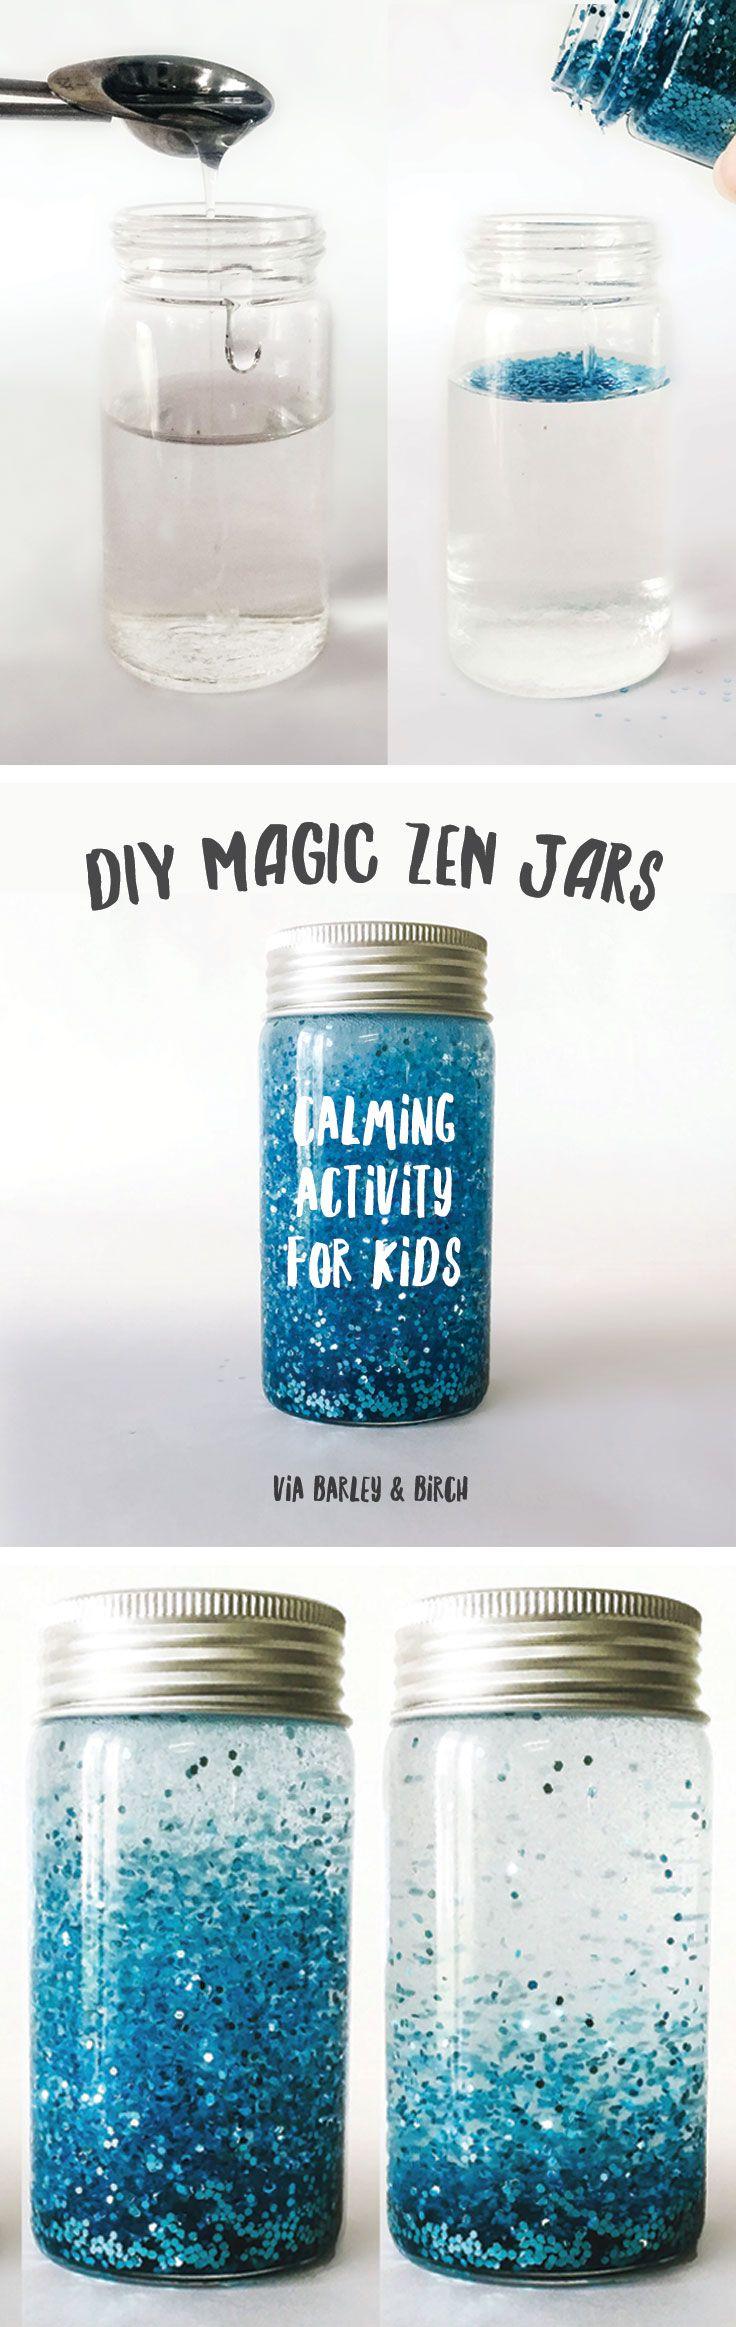 DIY Craft: Make a DIY magic zen jar to help calm kids and sneak in a little meditation practice - via barley and birch